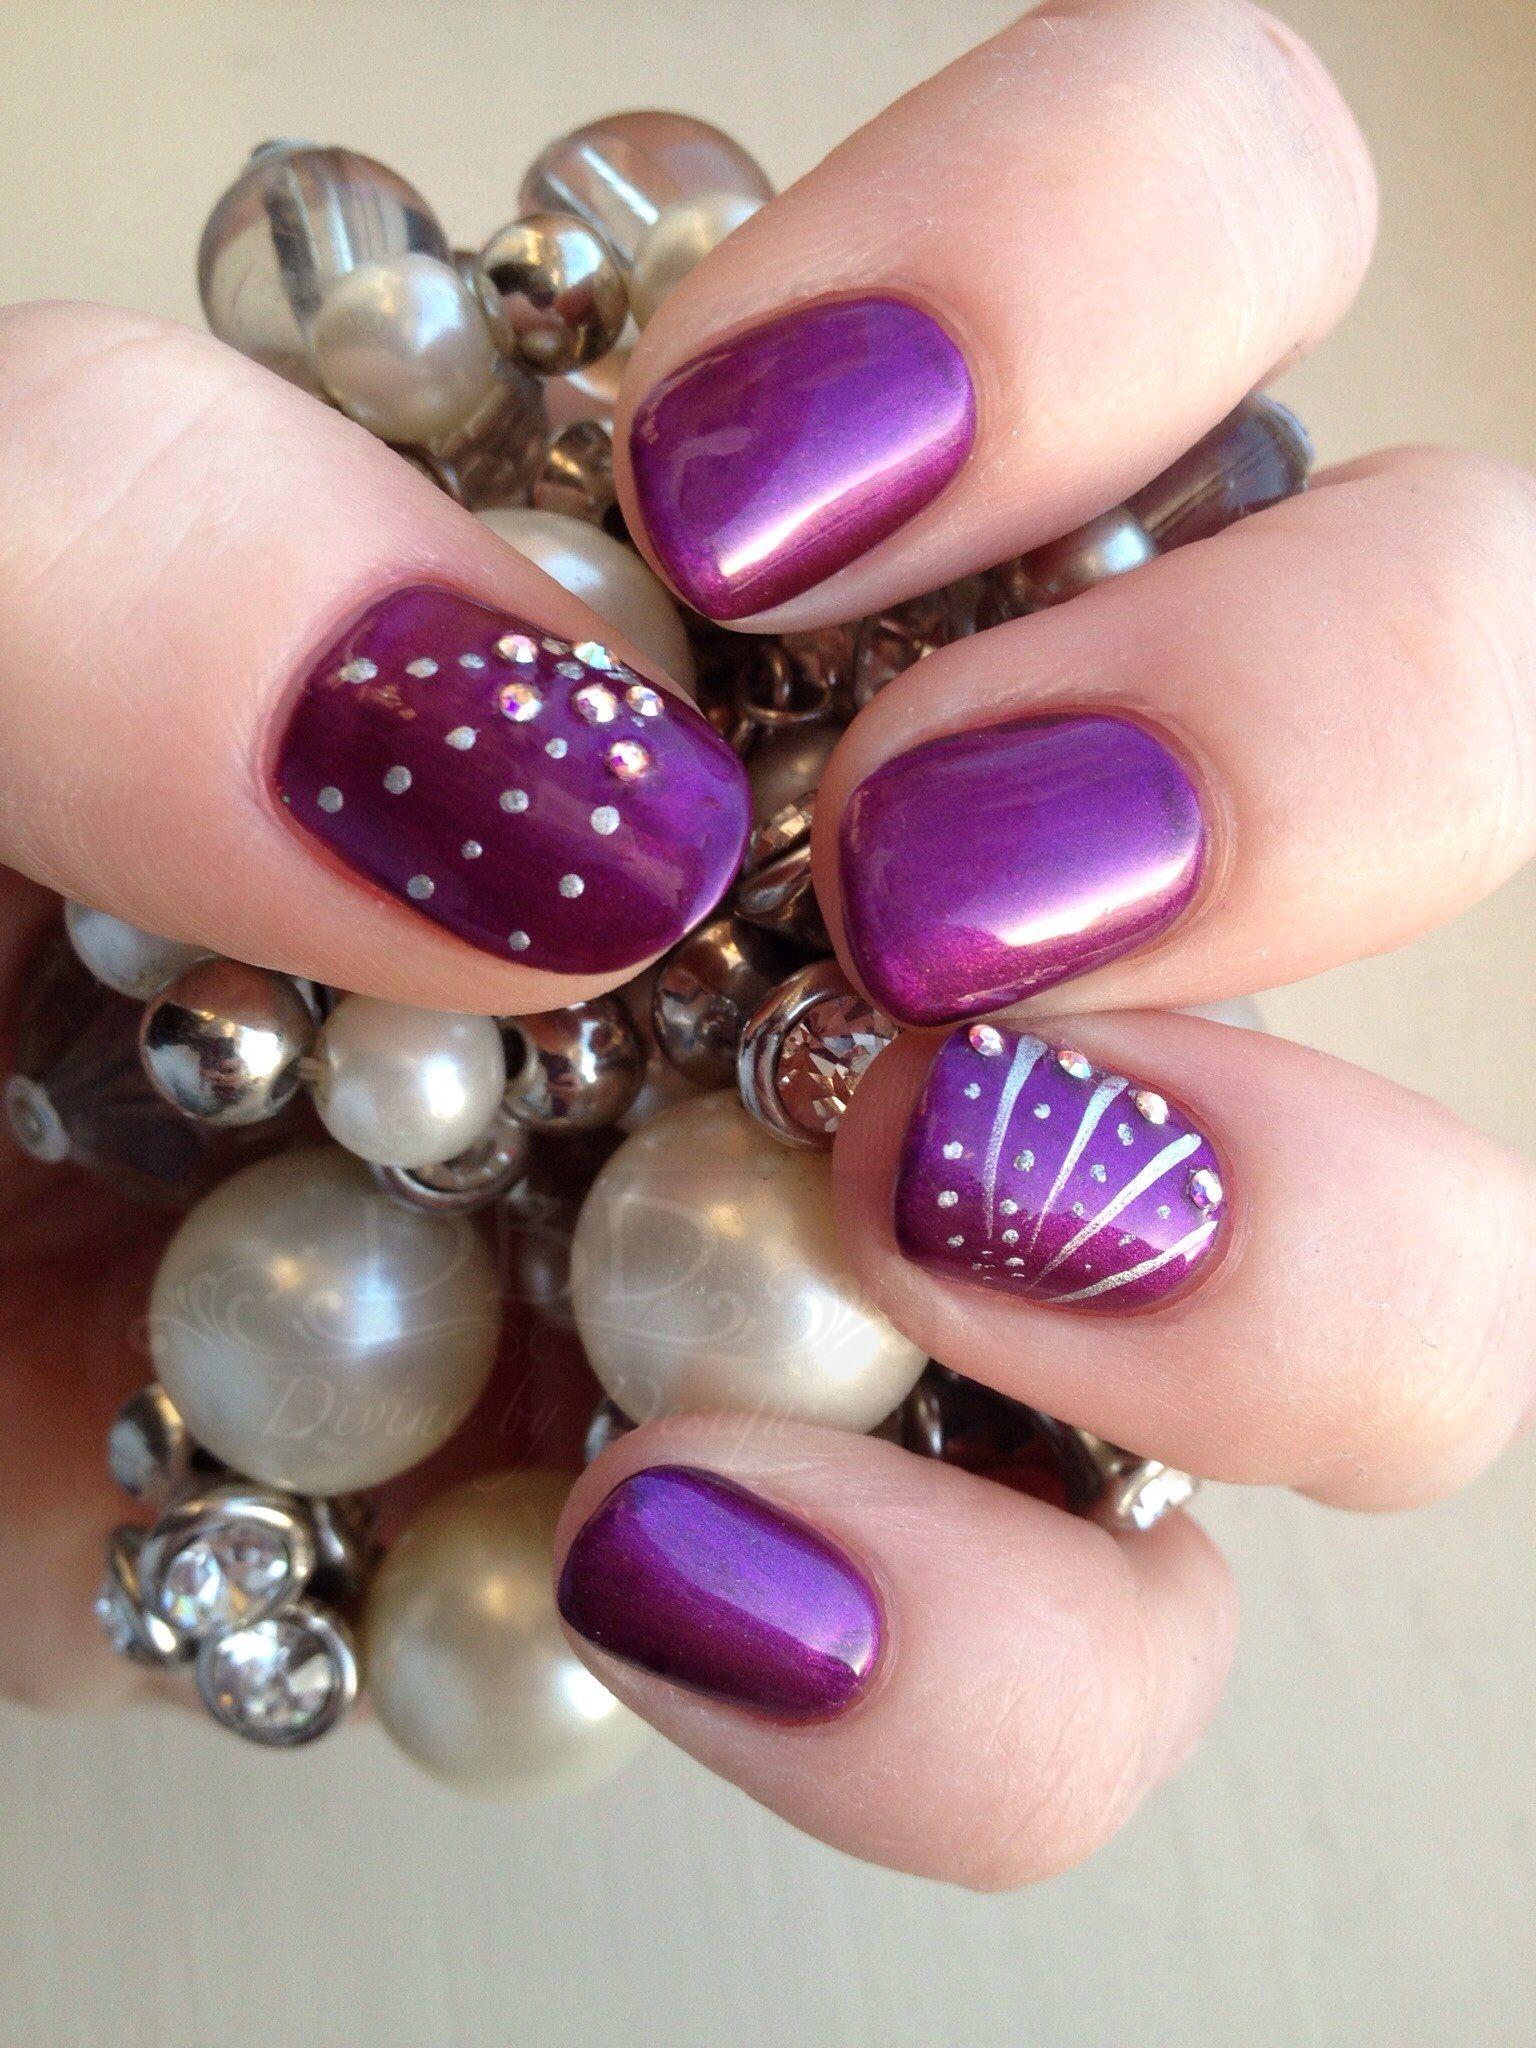 CND Shellac with Additives, CND Colour nail art and Swarovski Crystals xDBDx www.Facebook.com/DivineByDesignBeauty